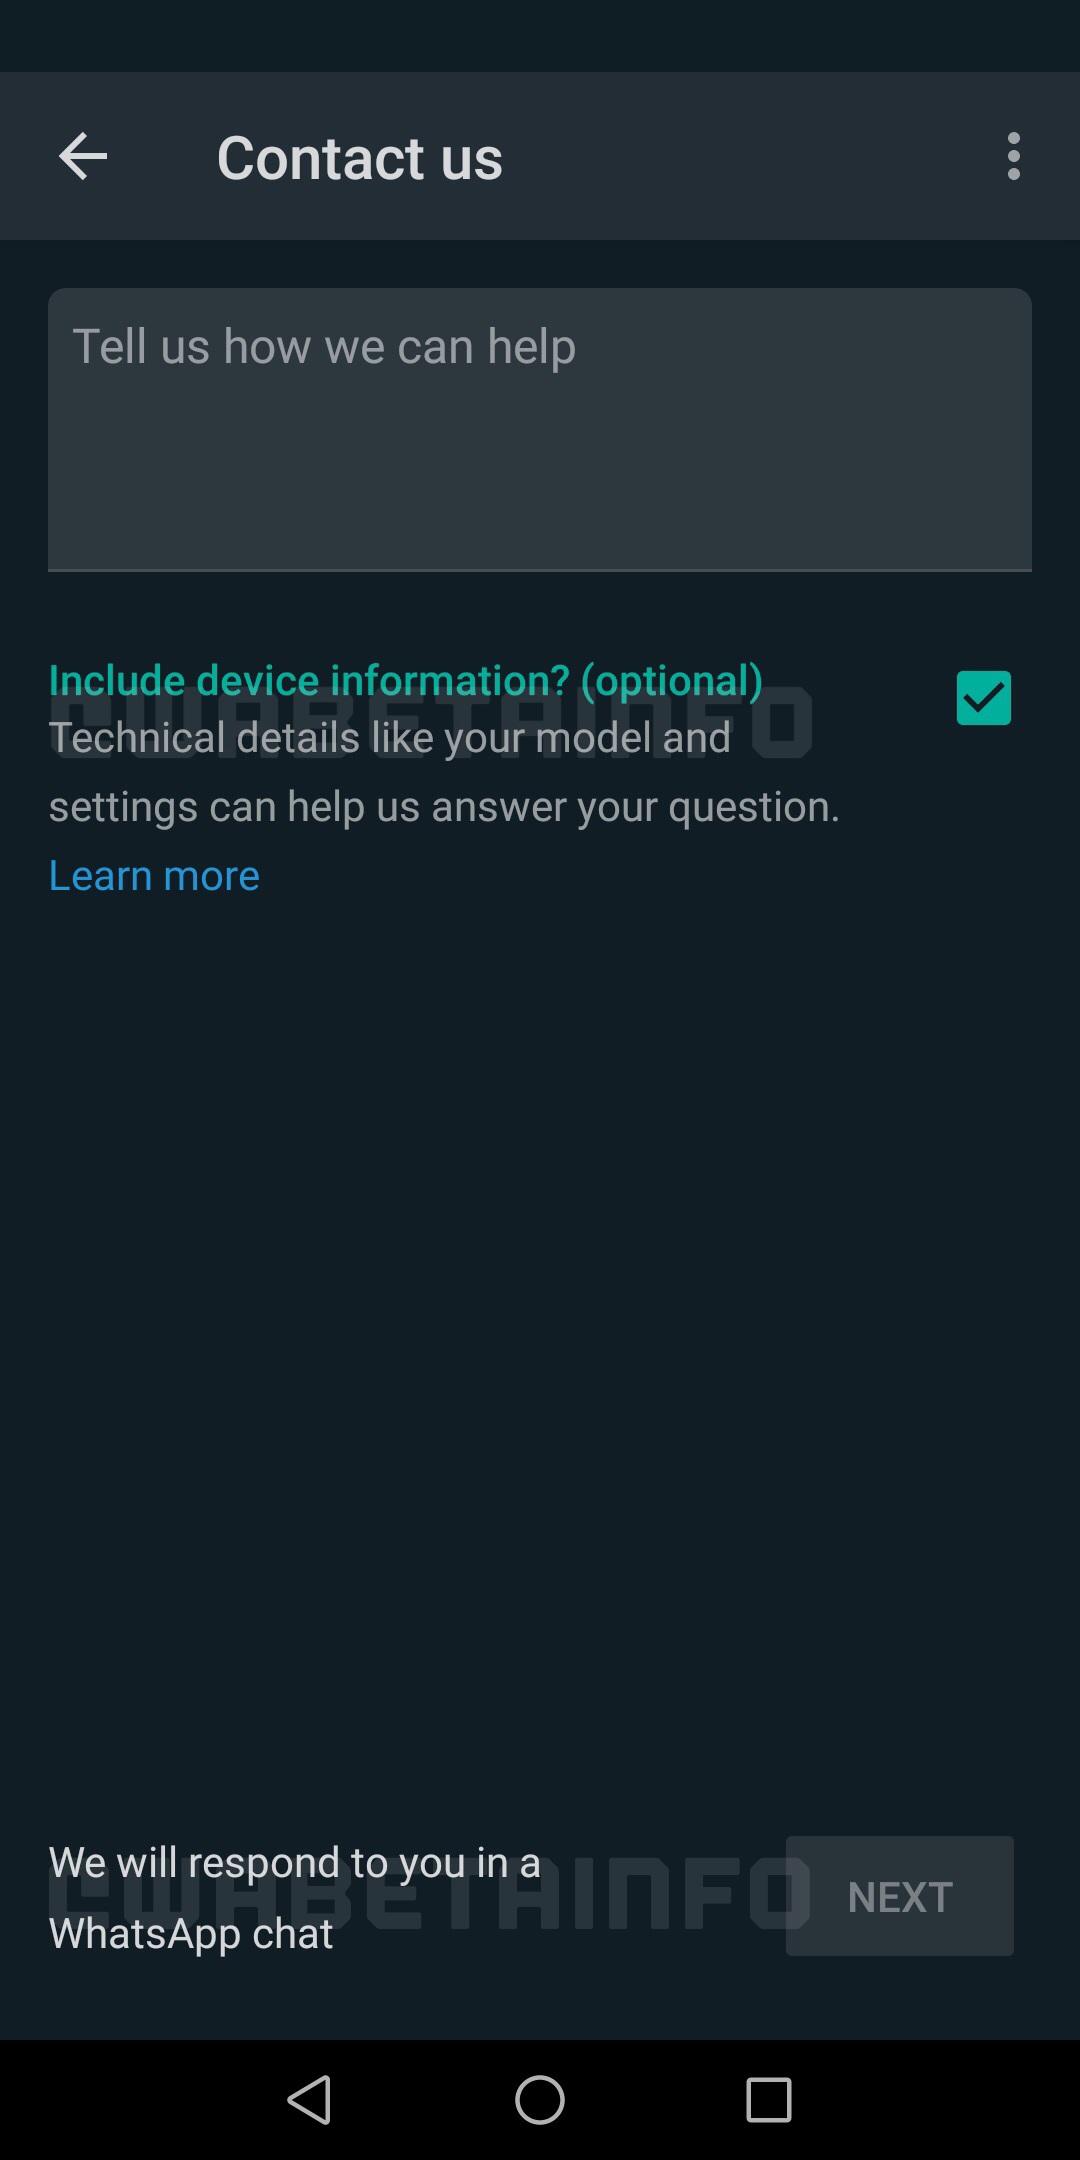 WhatsApp colaborare ajutor